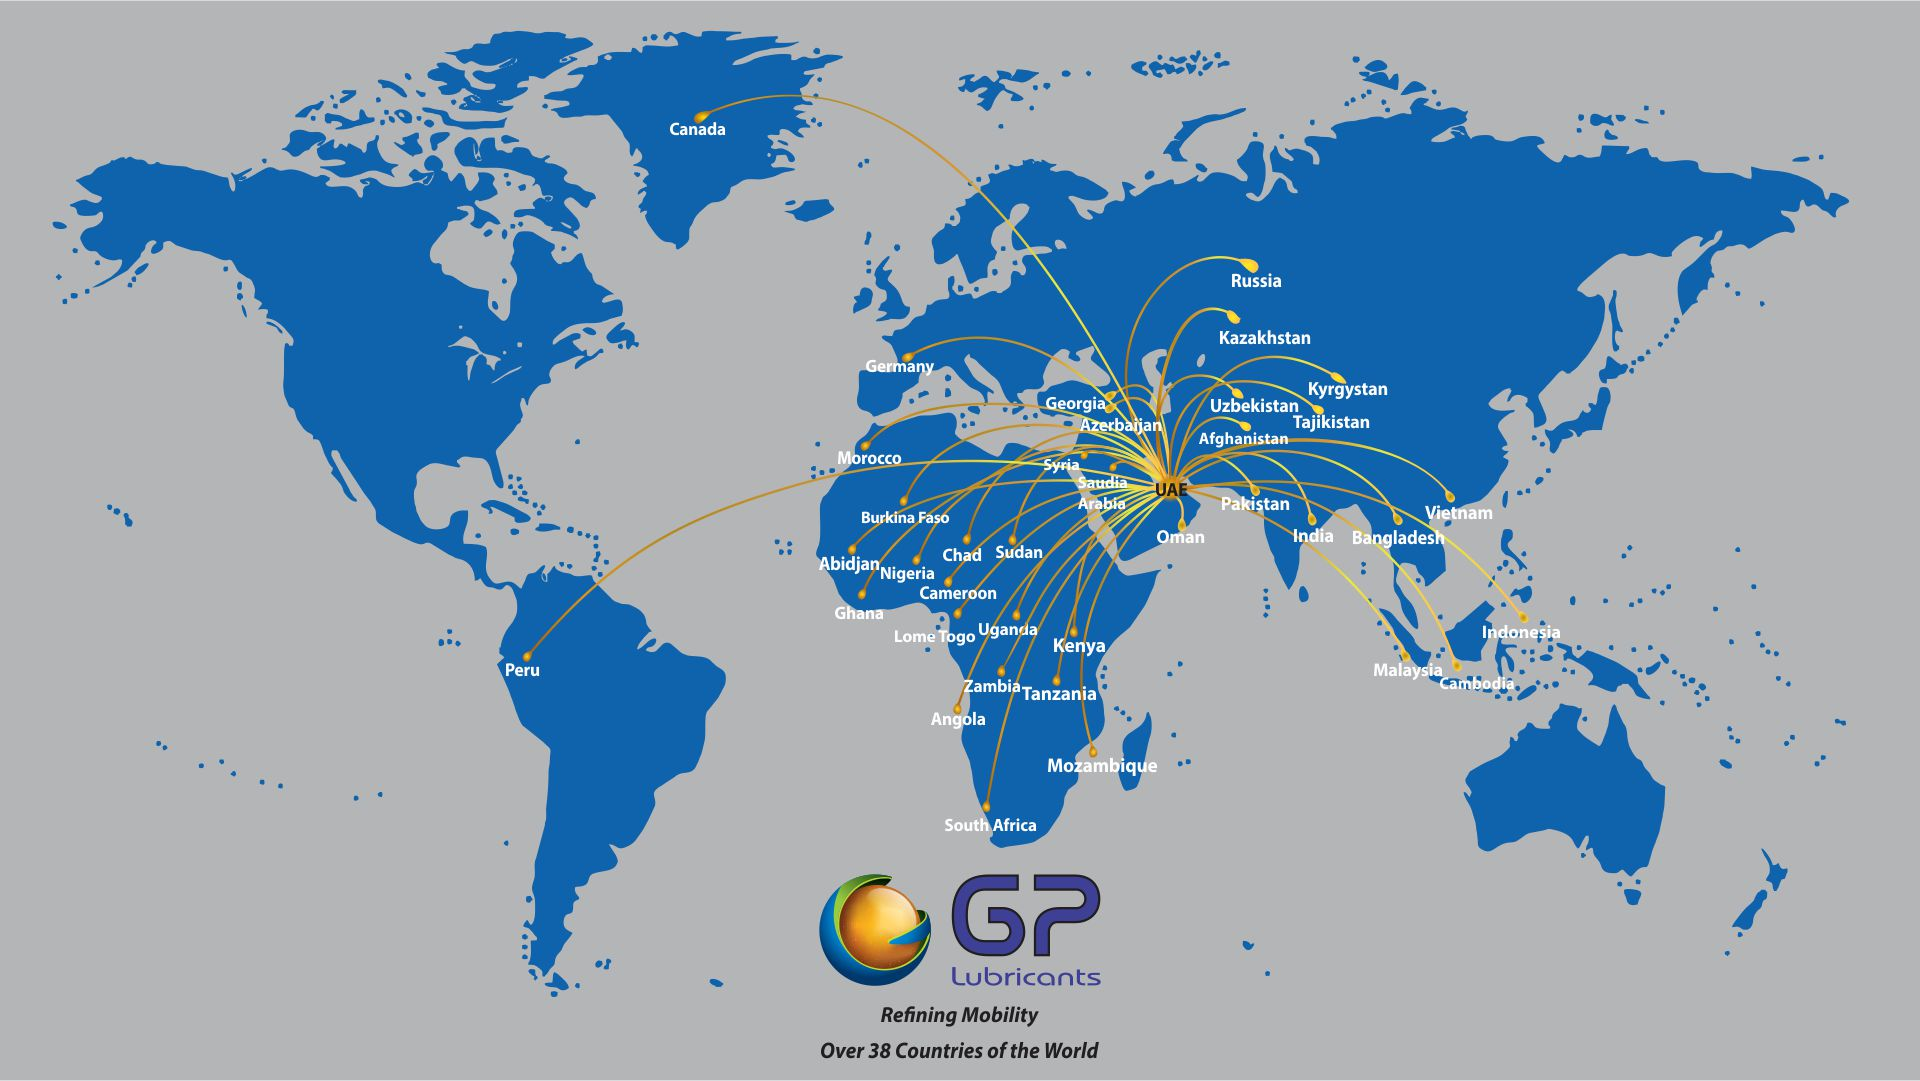 GP Presence world wide